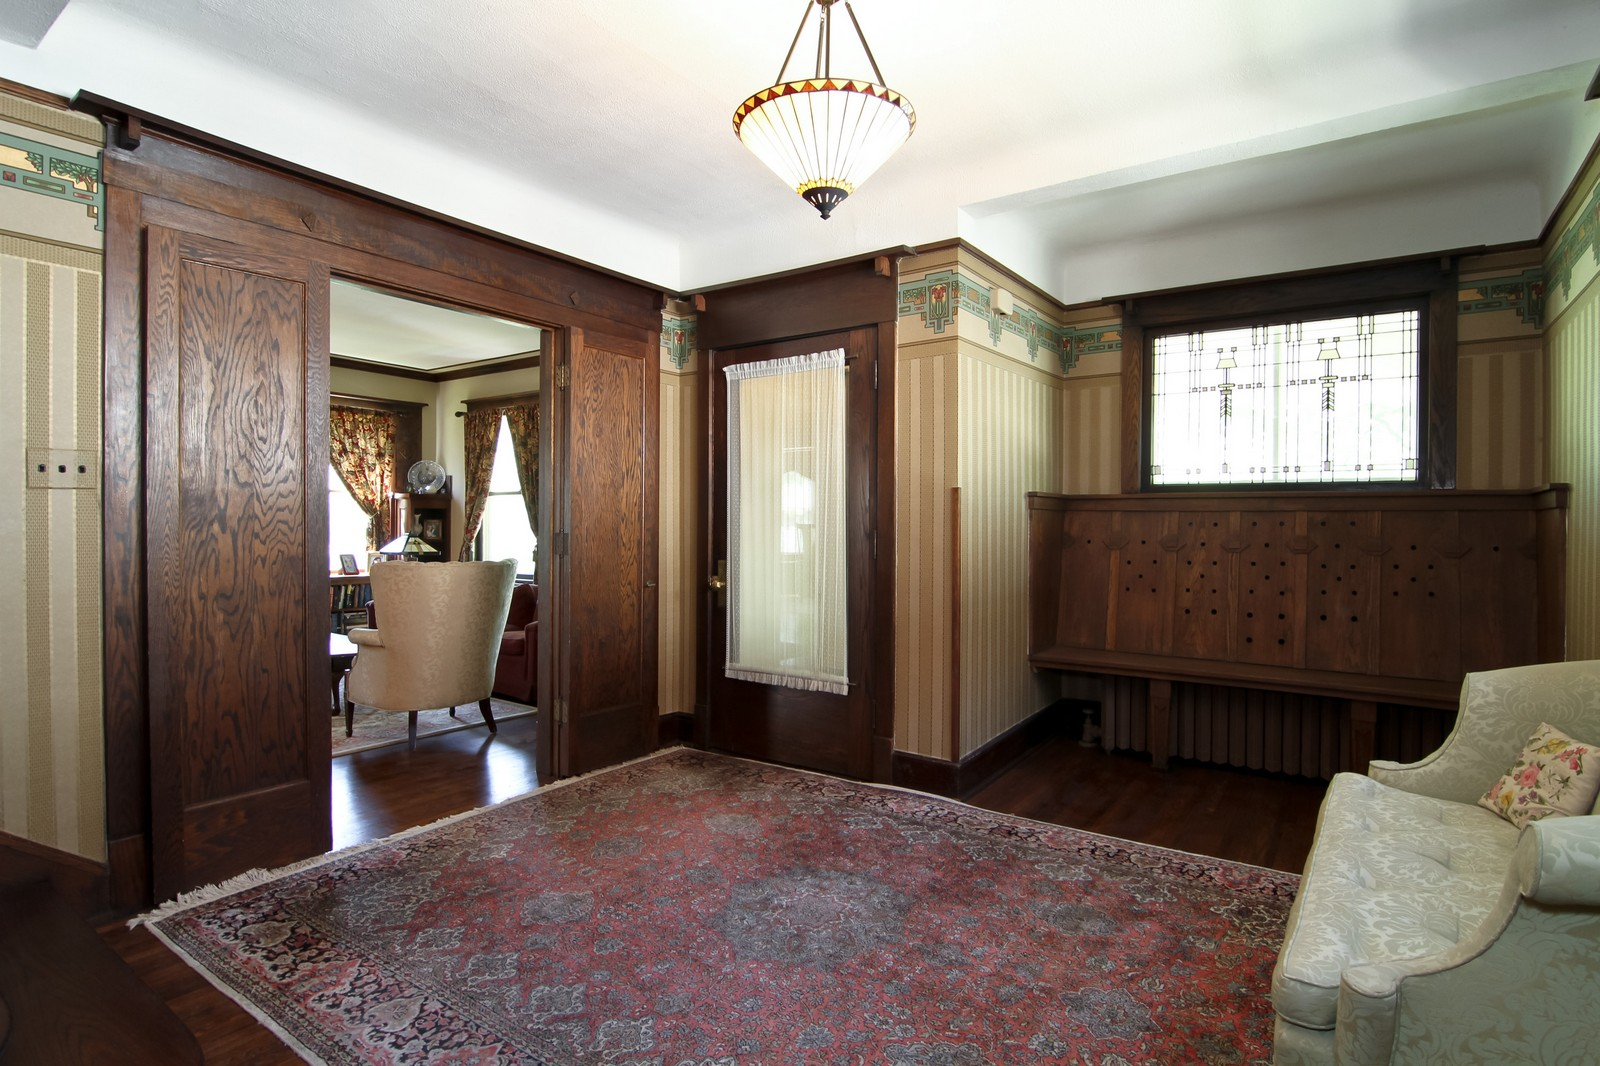 Real Estate Photography - 239 6th Avenue, La Grange, IL, 60525 - Entryway